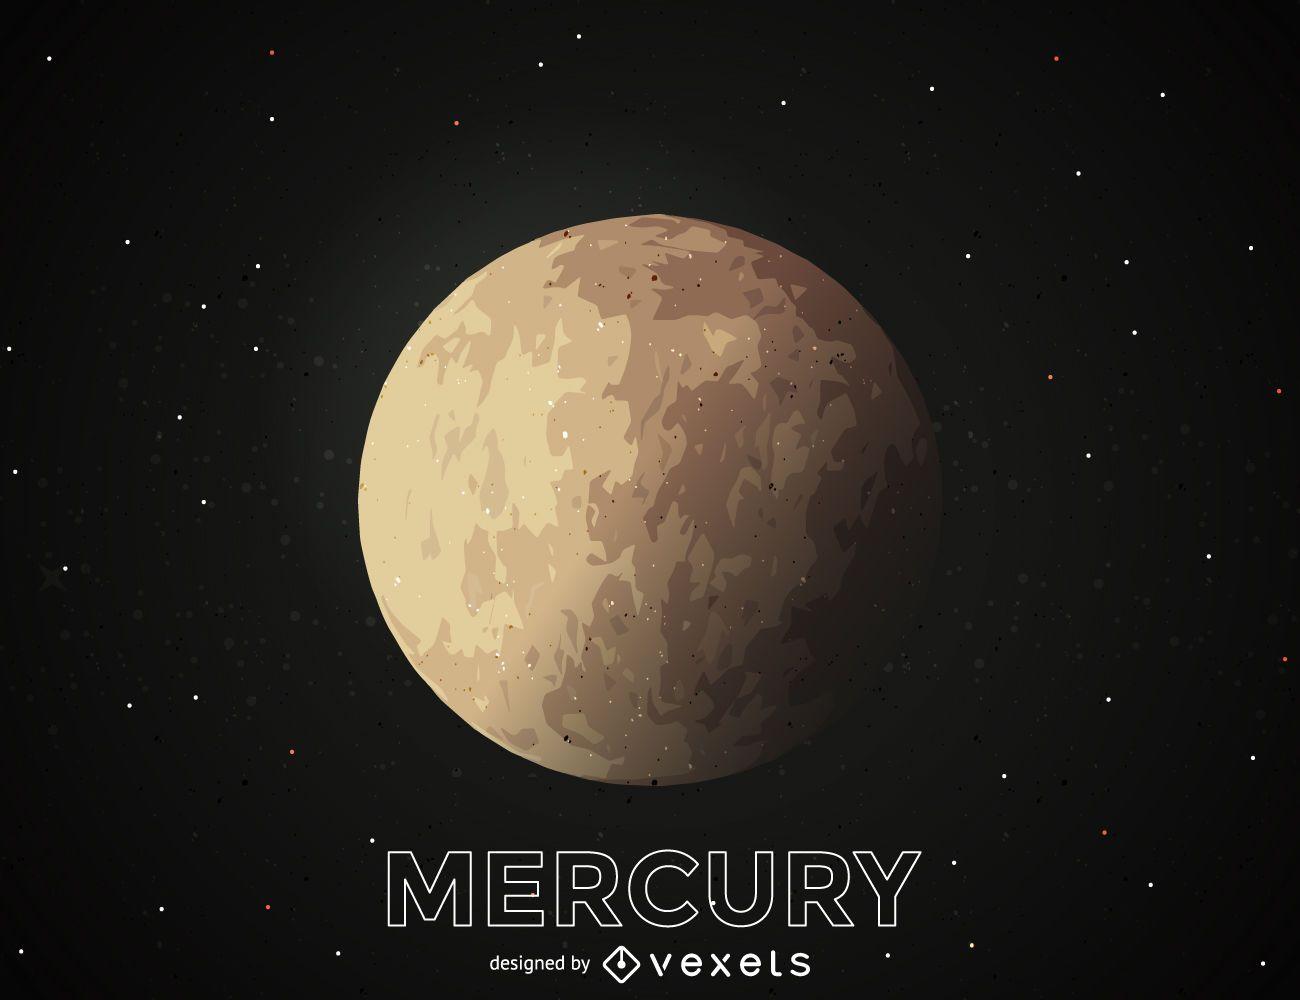 Mercury planet illustration